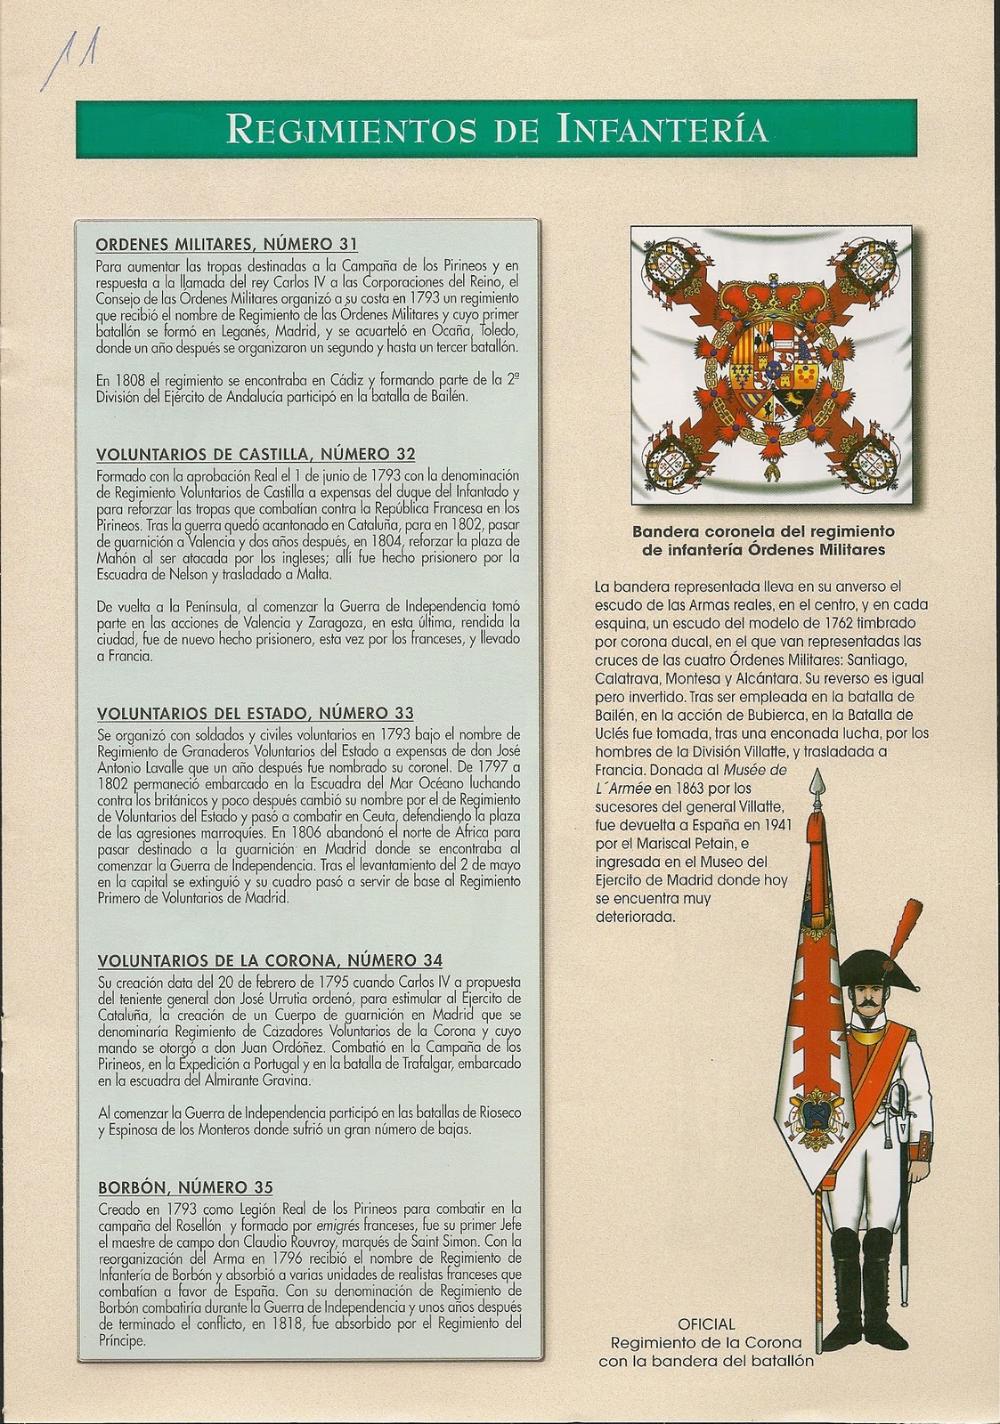 Miniaturas Militares Por Alfons Cànovas El Ejercito Español De 1808 3ª Parte Fuente Ristre Militar Ejercito Infanteria